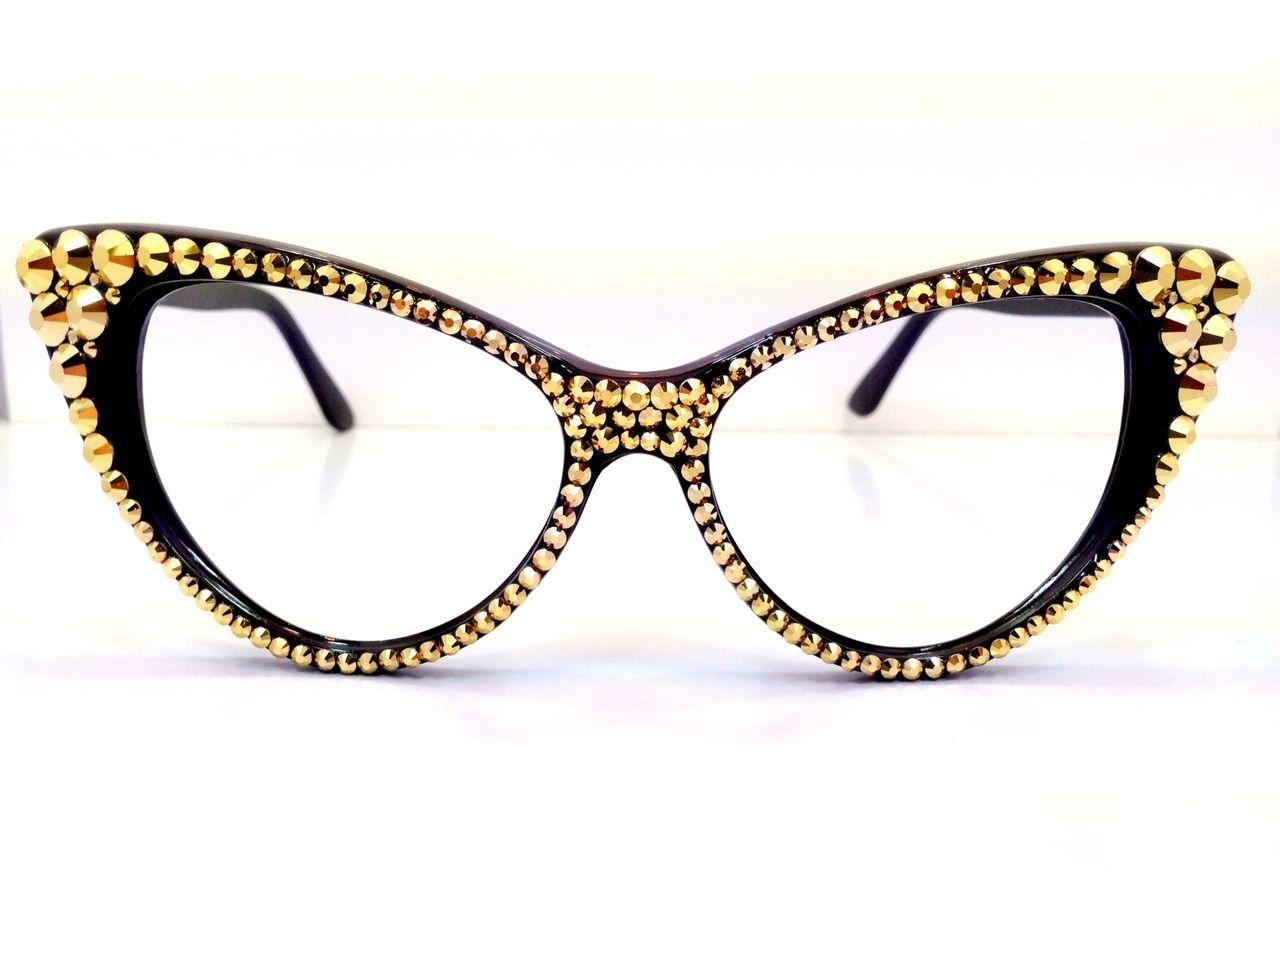 a2e44e1dfdcab Optical Crystal Cateye Reading Glasses - Divalicious Jewelry